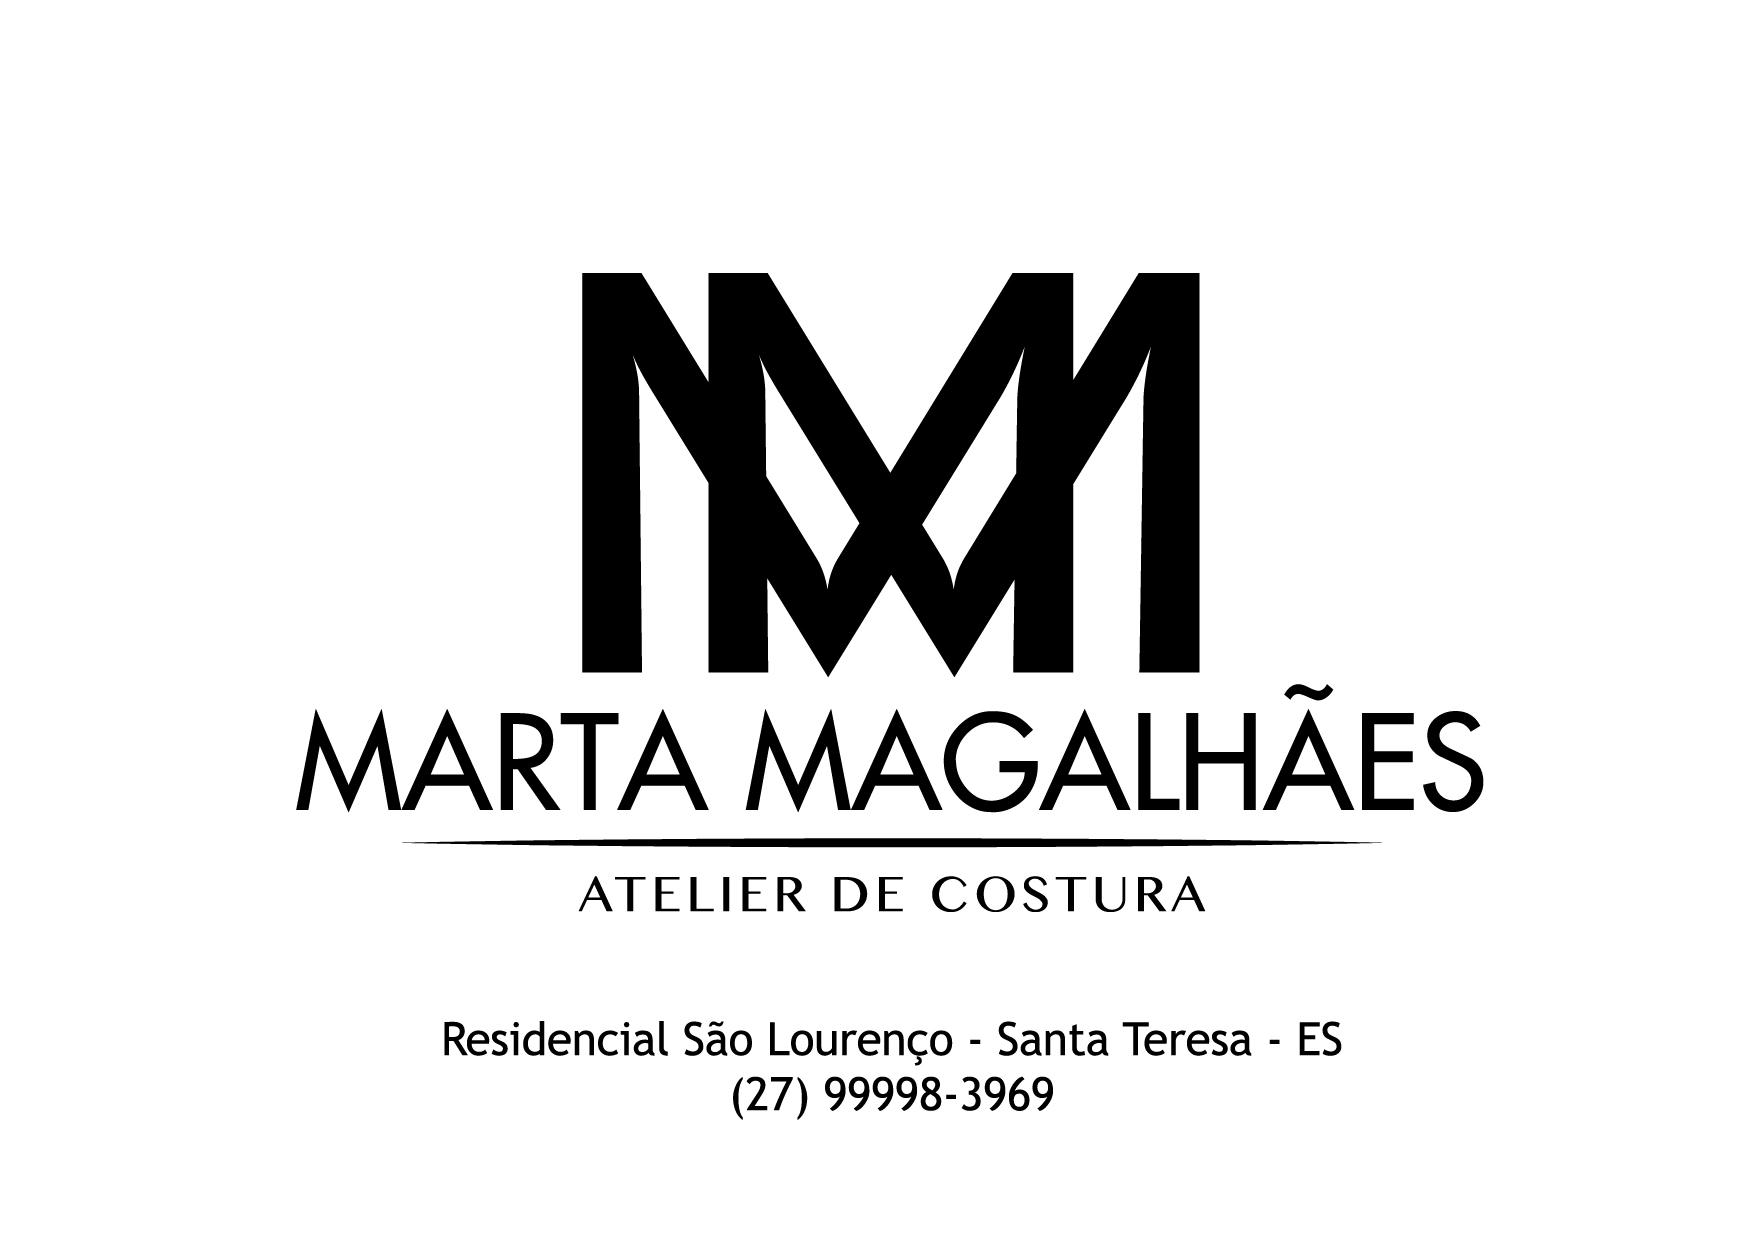 Ateliê Marta Magalhães